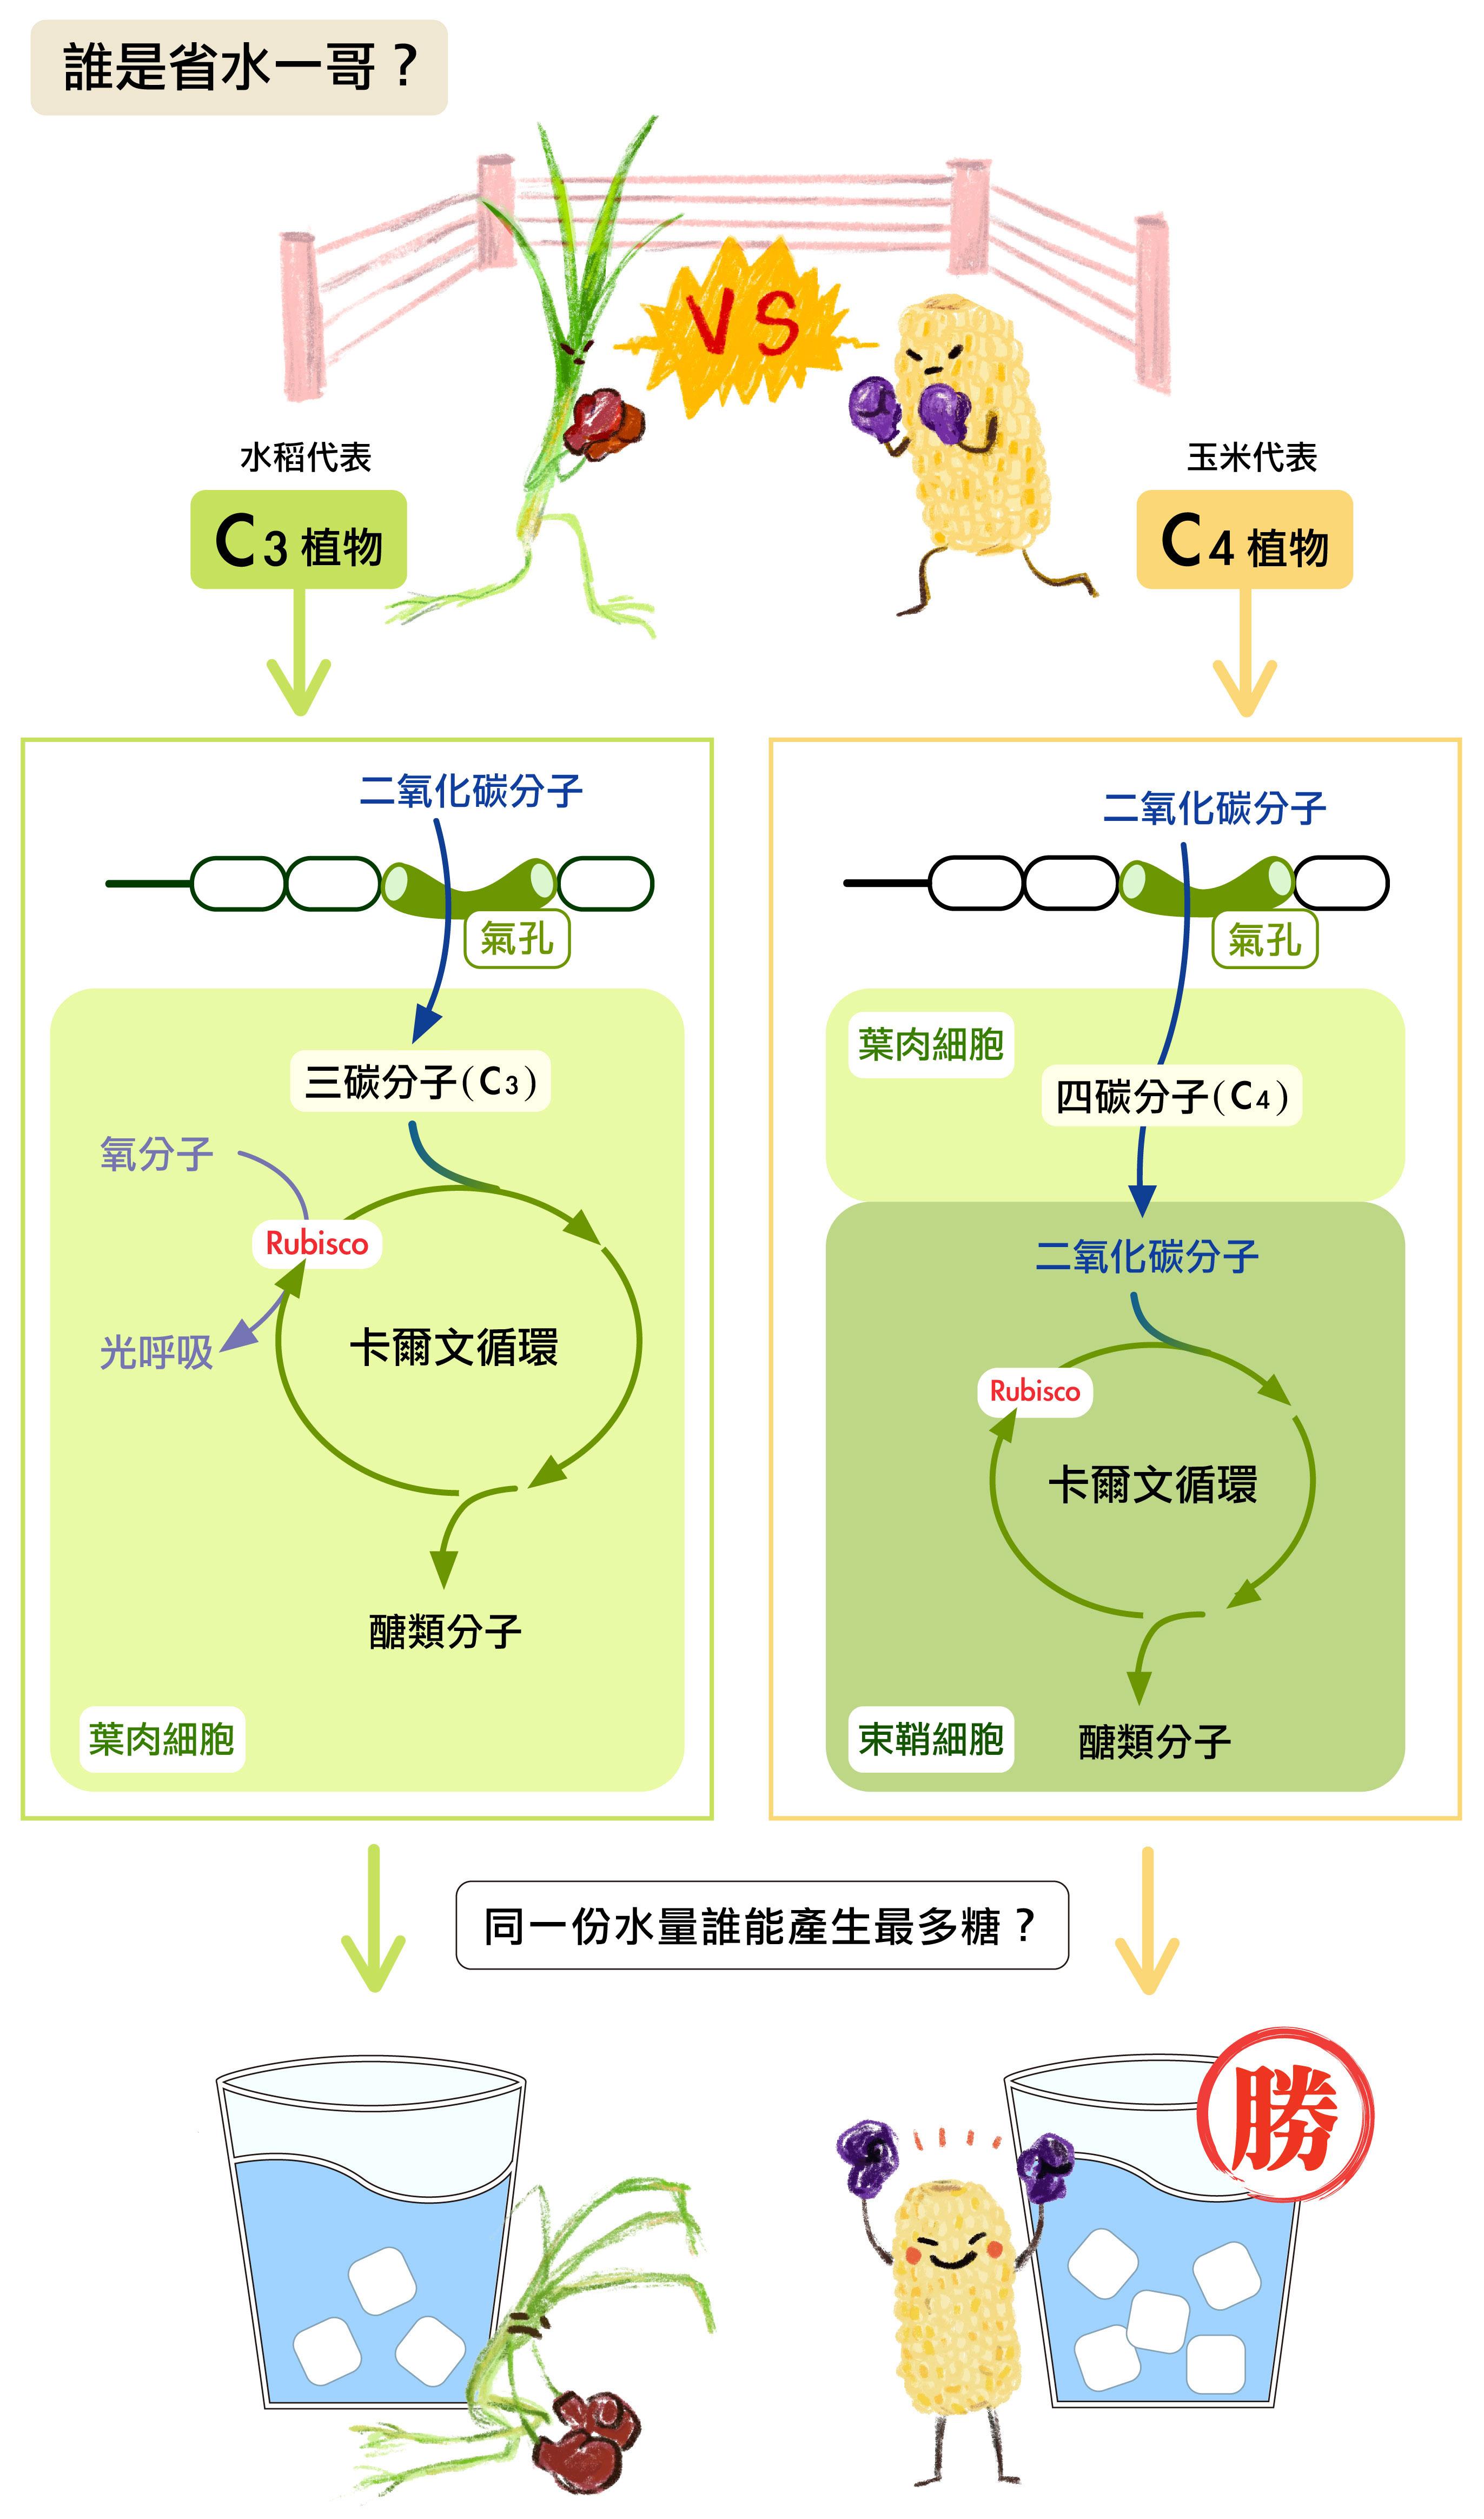 C3 植物,意即光合作用轉化二氧化碳最先產物為三碳化合物, C4 植物最先產物則是四碳化合物。C4 型植物的葉片中具有特殊的組織結構,以及複雜的酵素生化反應,可以讓二氧化碳更有效率地轉換成糖類,並且減少在蒸發作用流失水分。換句話說,以同樣的水量灌溉,C4 植物可產生的糖比較多。國際 C4 水稻計畫,簡言之,即把屬於 C3 型植物的水稻改造成 C4 型植物。圖說設計│黃曉君、林洵安